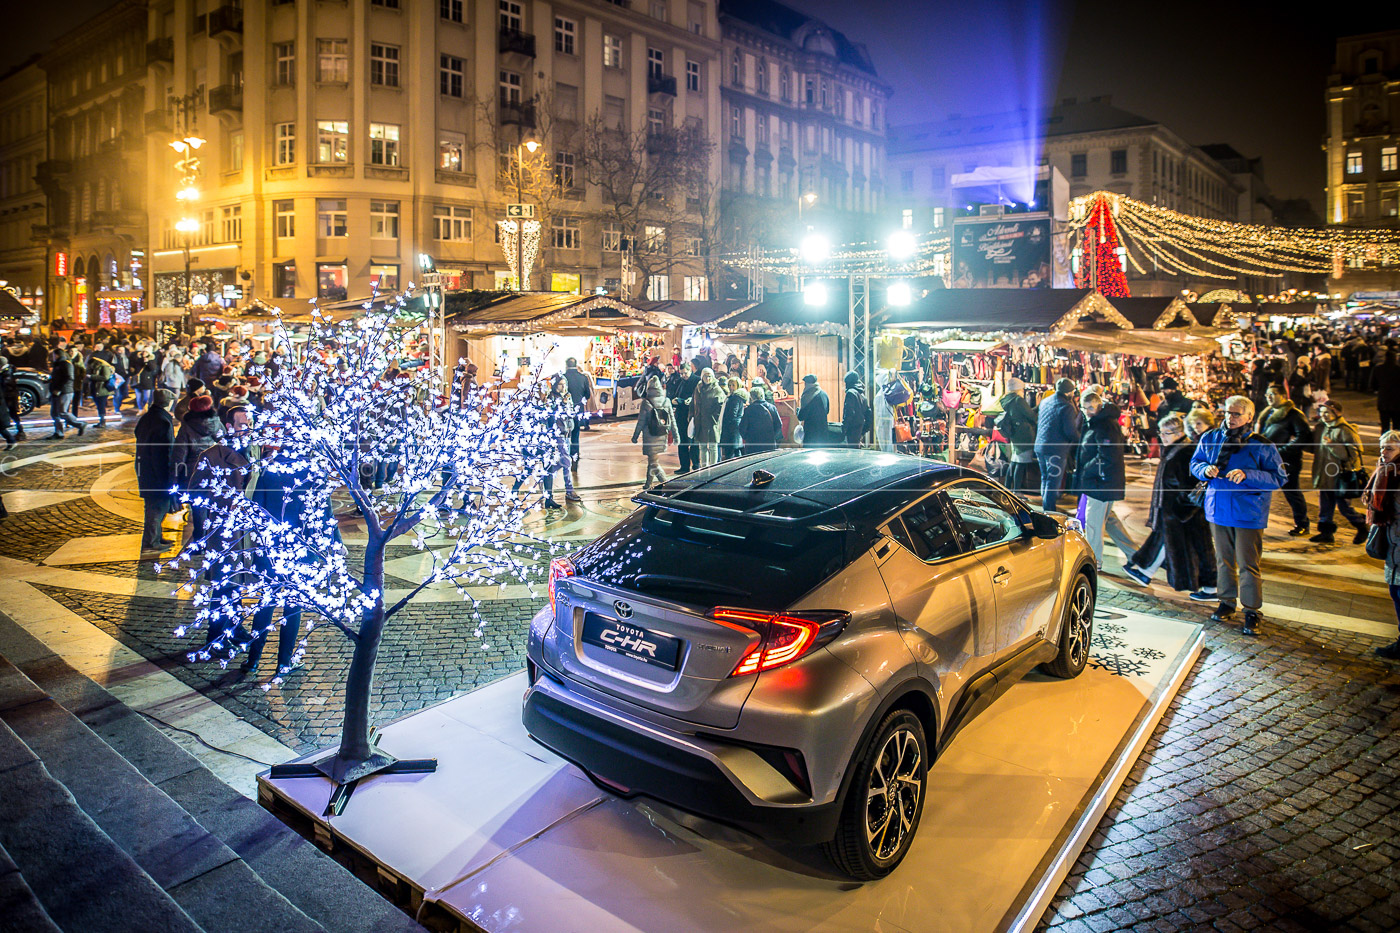 Piața de Crăciun de la Budapesta